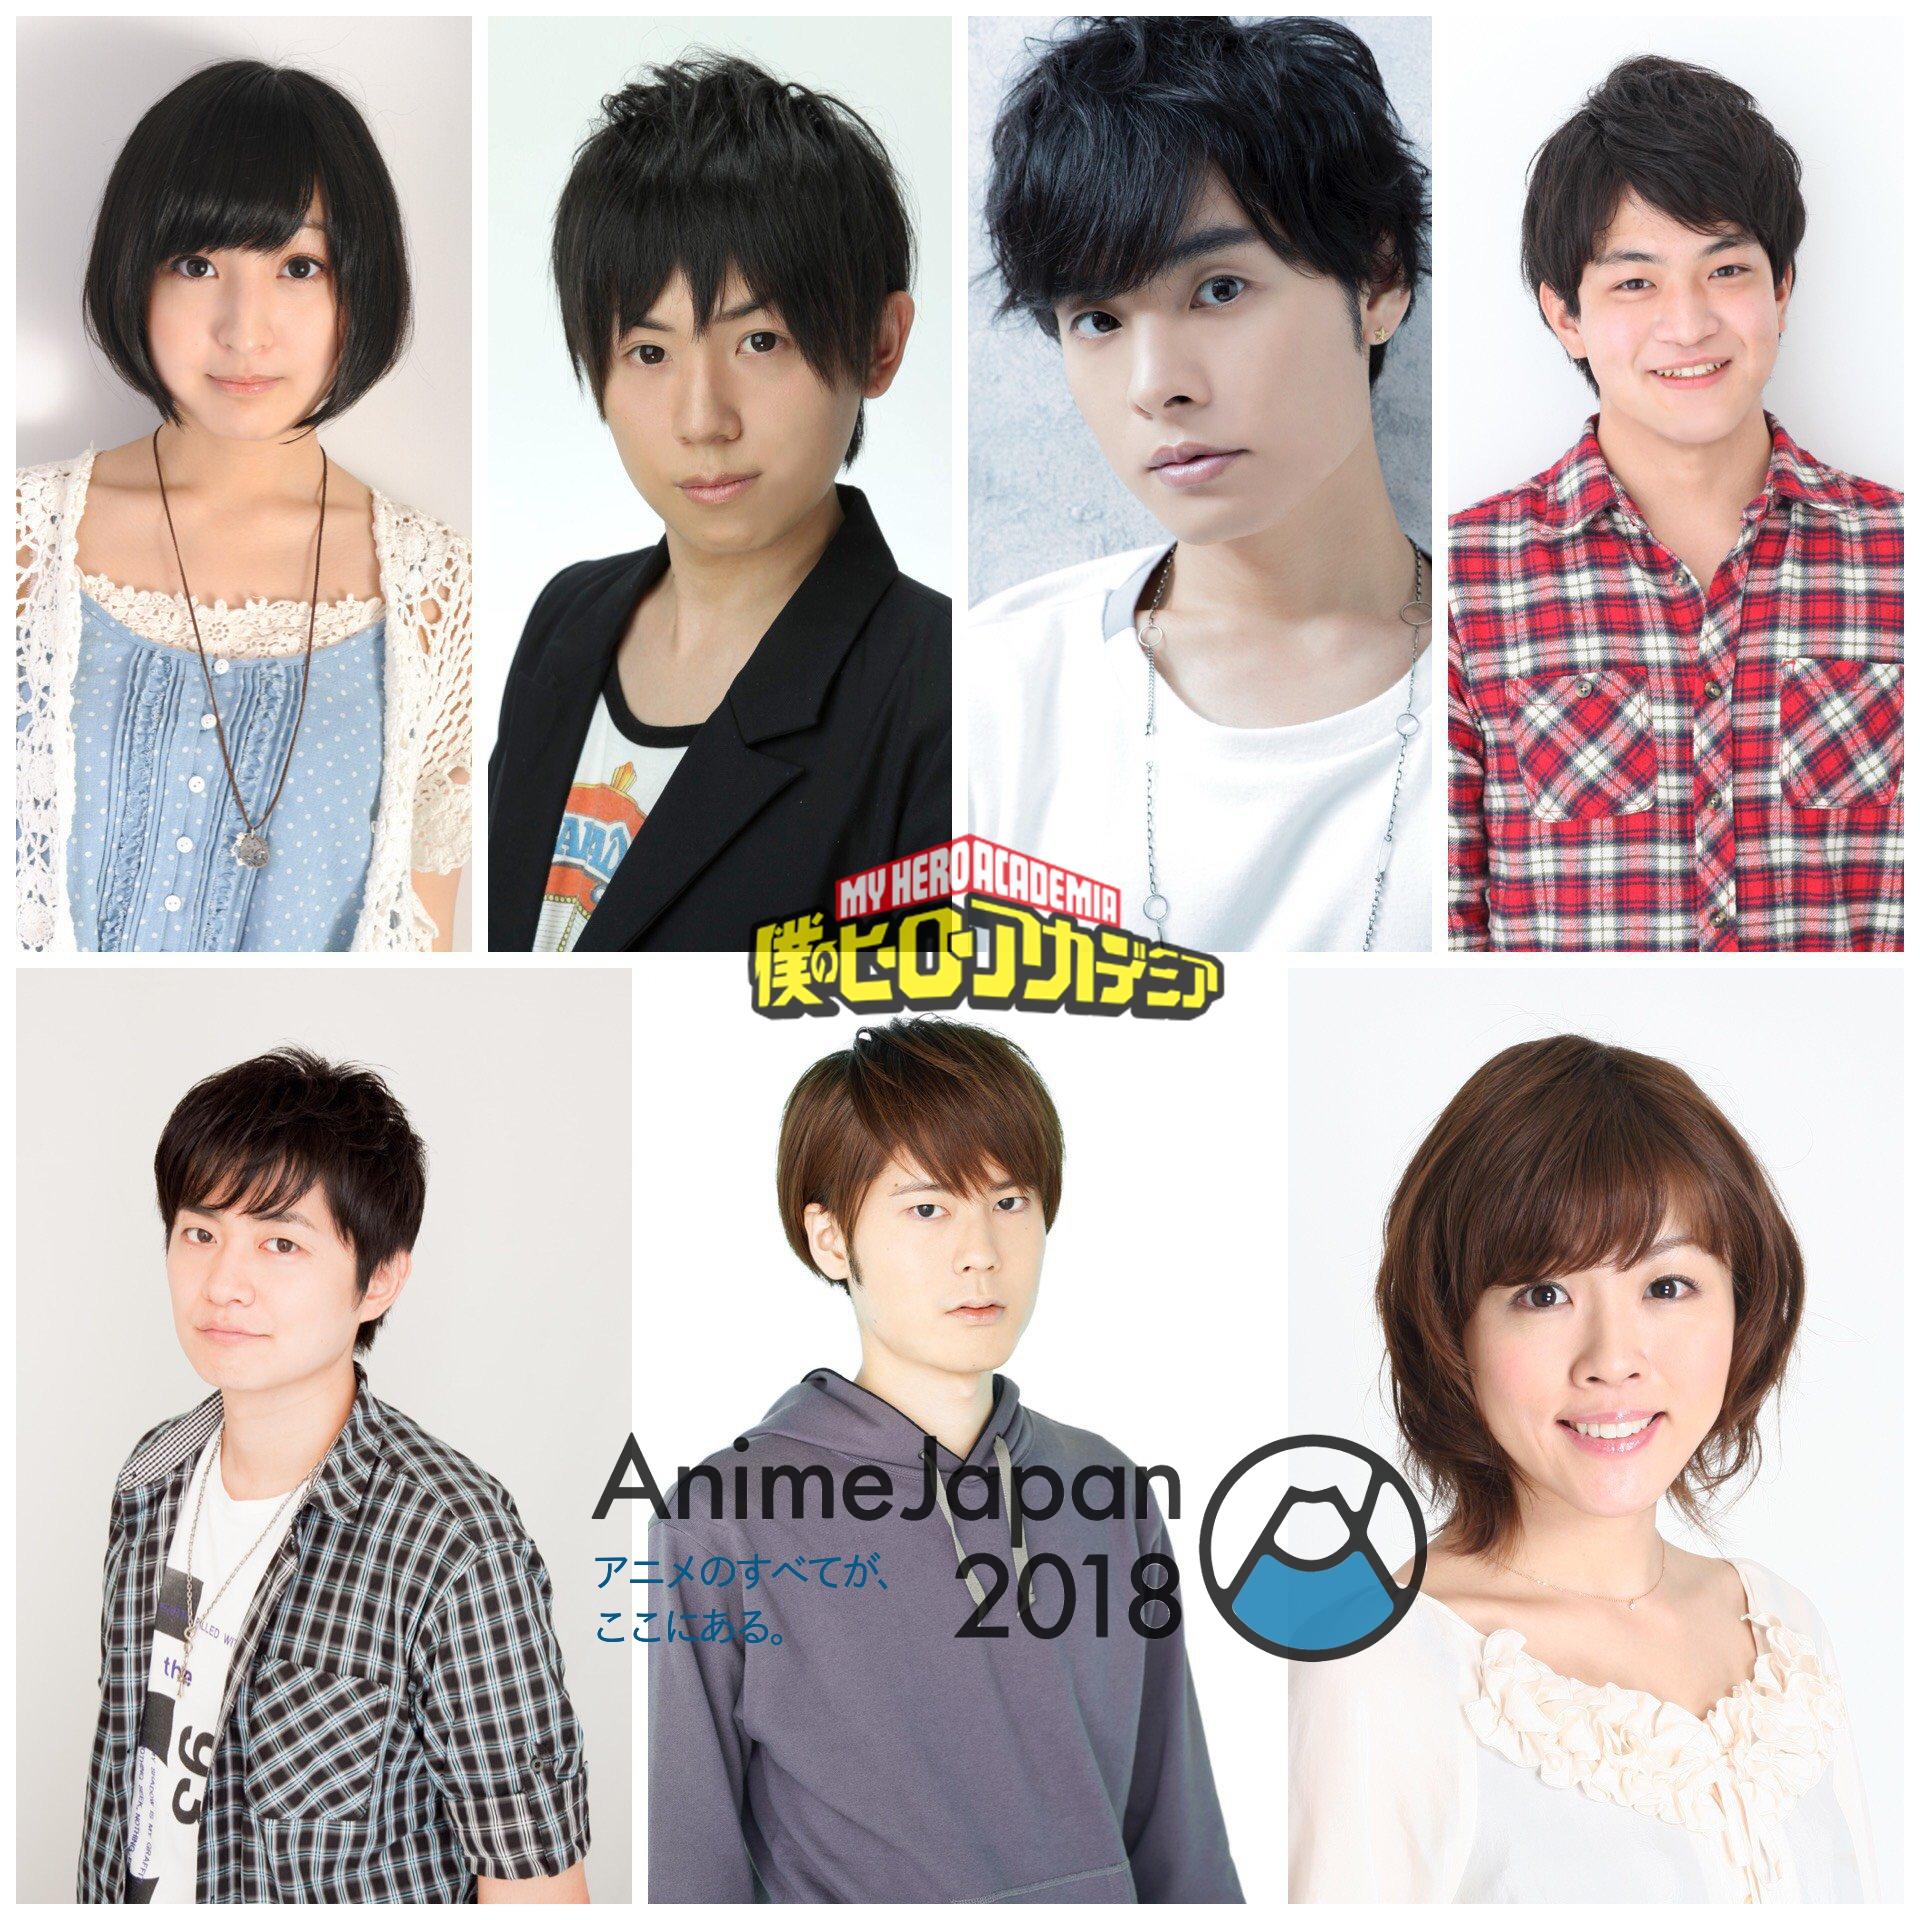 AnimeJapan2018